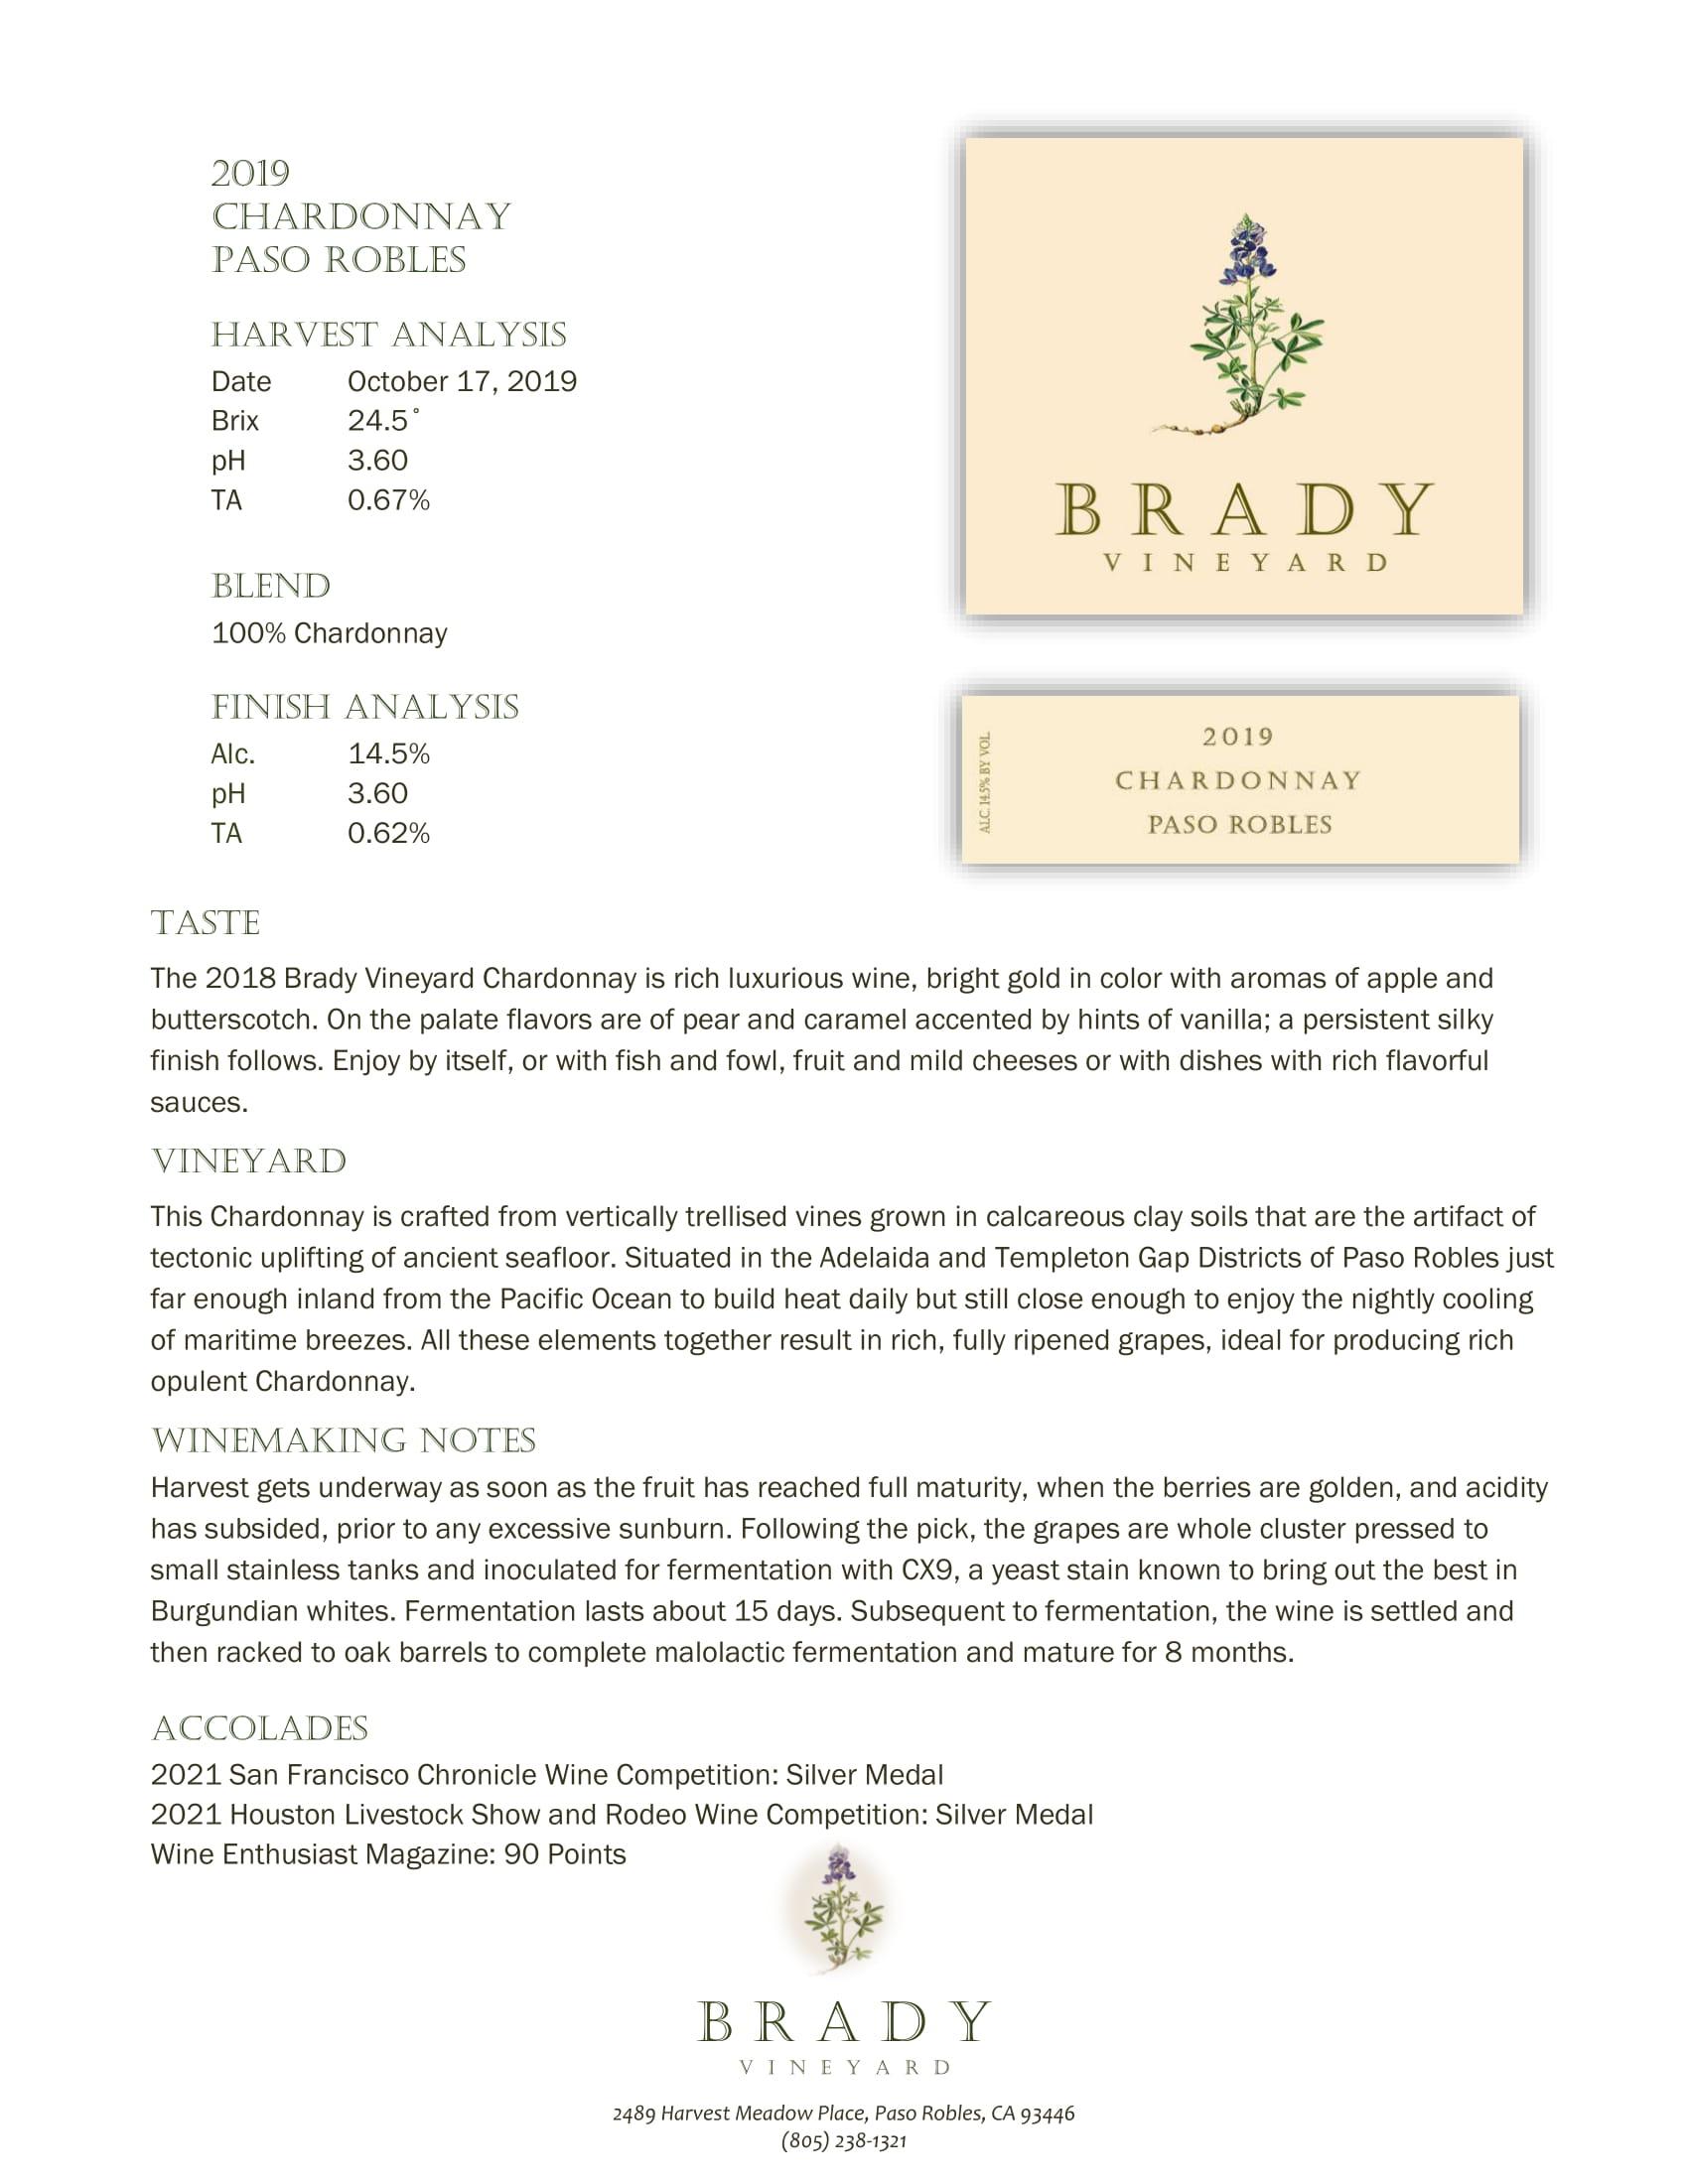 Brady Vineyards Chardonnay Sell Sheet